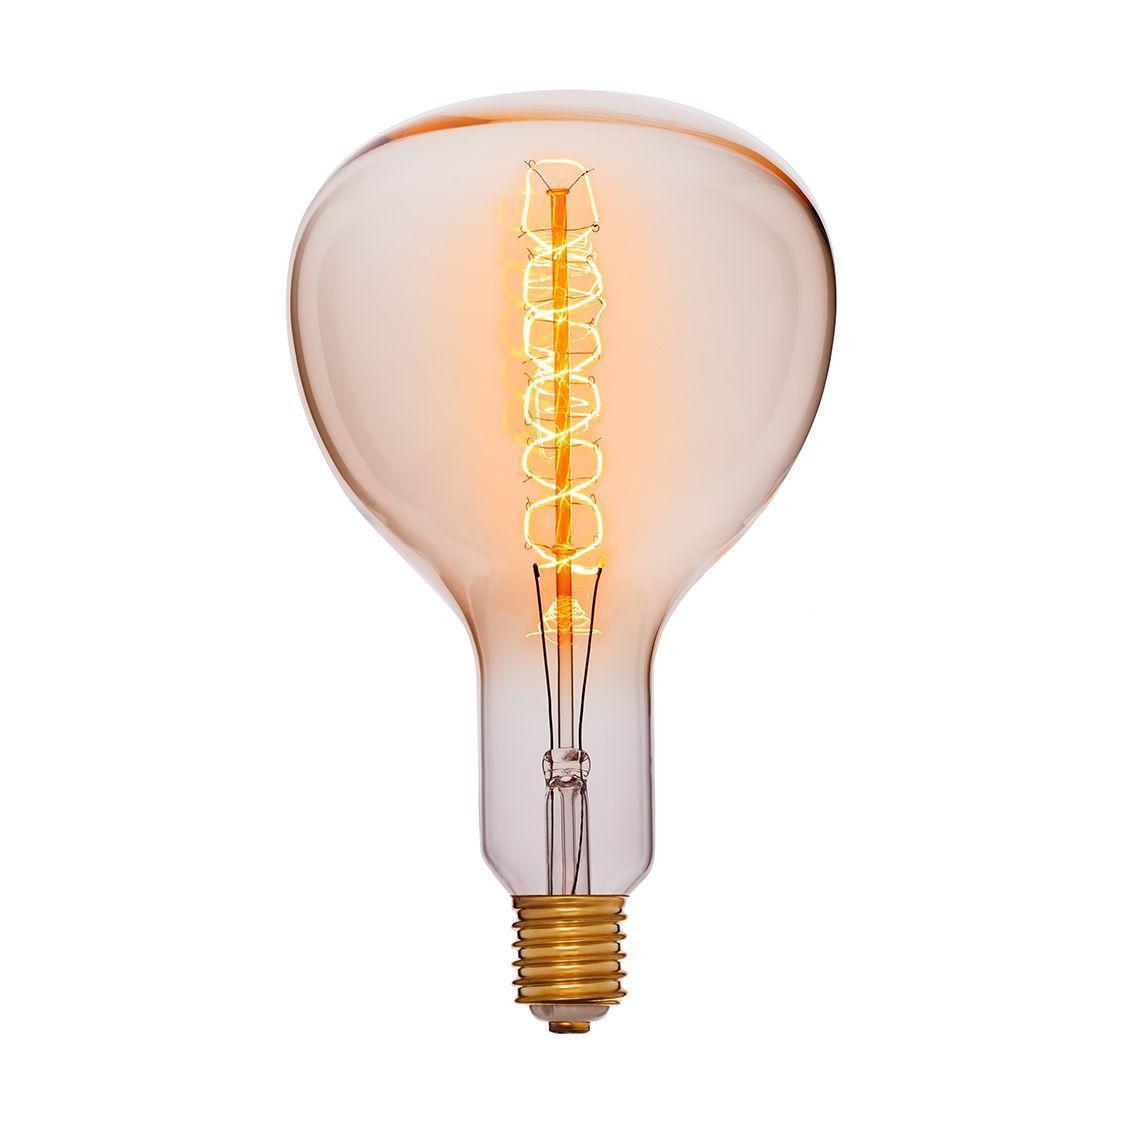 Лампа накаливания E40 95W прозрачная 053-839 лампа металогалогенная 04129 e40 400w 4000к труба прозрачная mh to 400 4000 e40